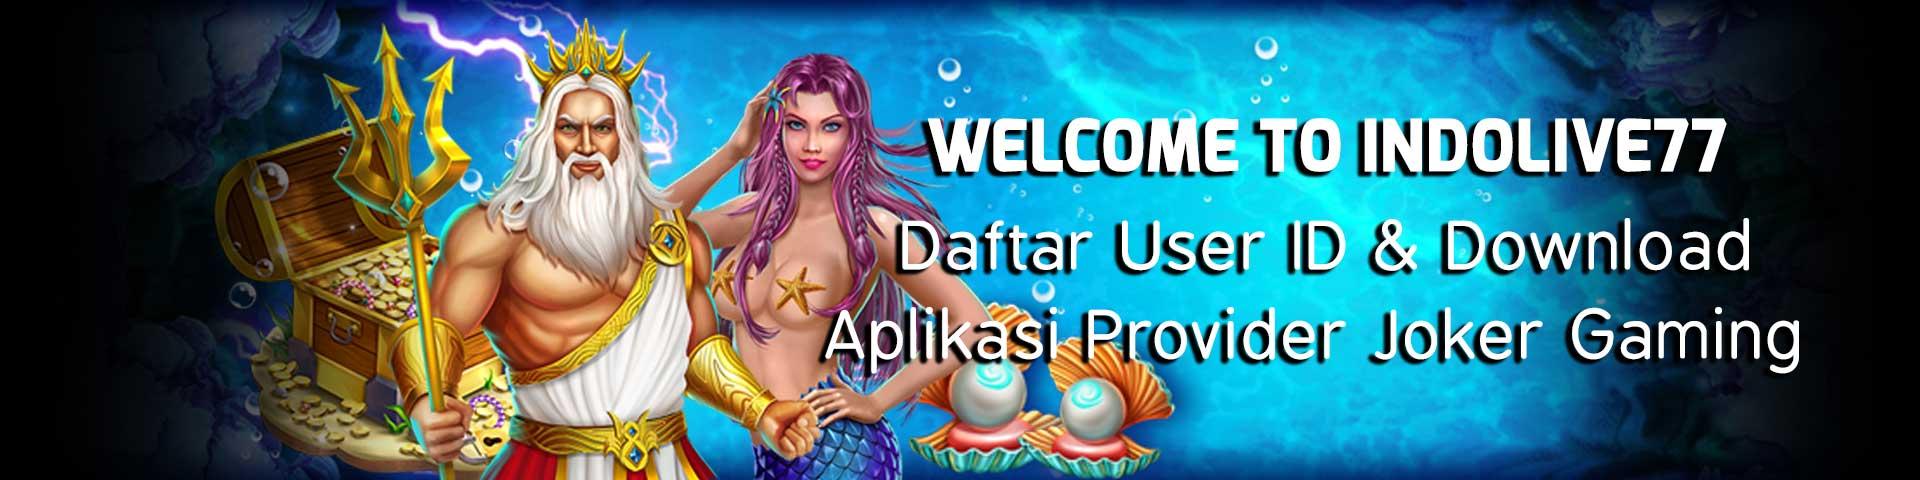 Joker Gaming Indonesia - Game Slot, Live Casino & Tembak Ikan Online